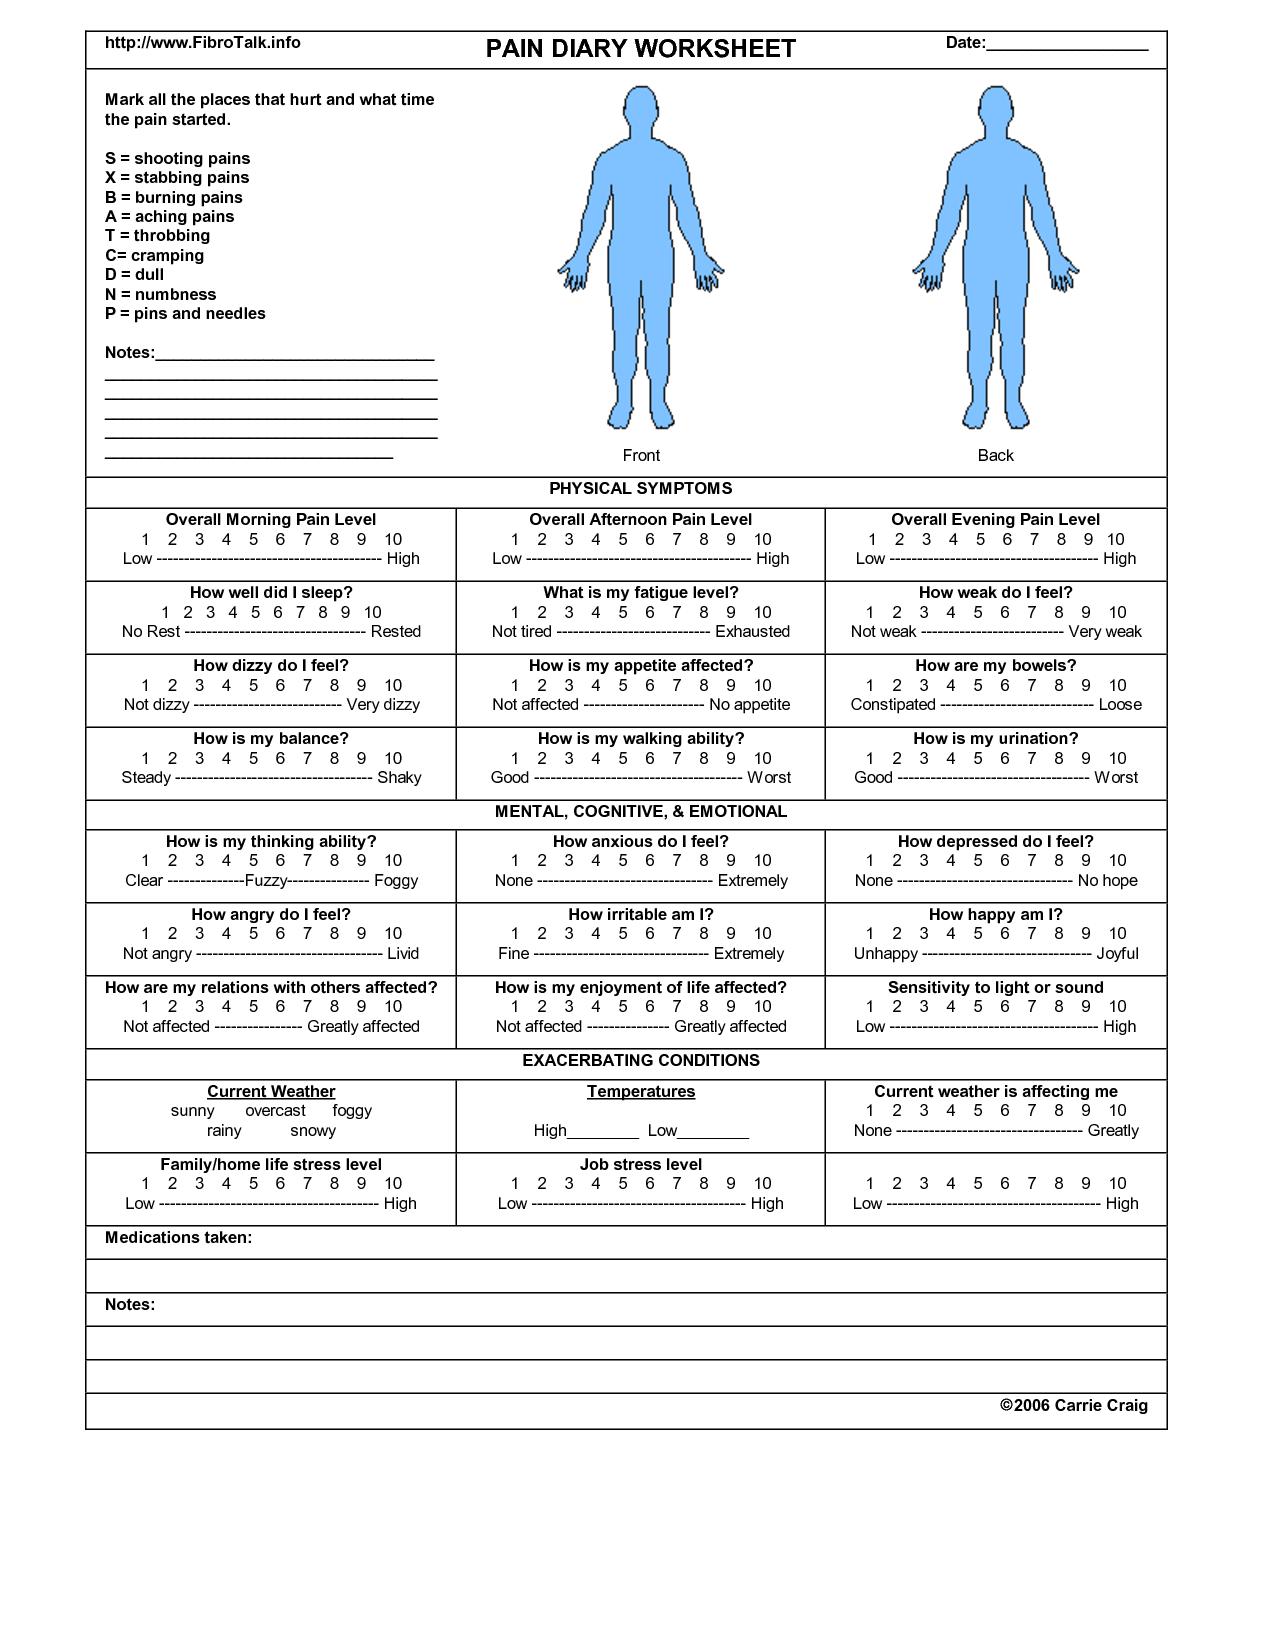 Daily Pain Diary Worksheet